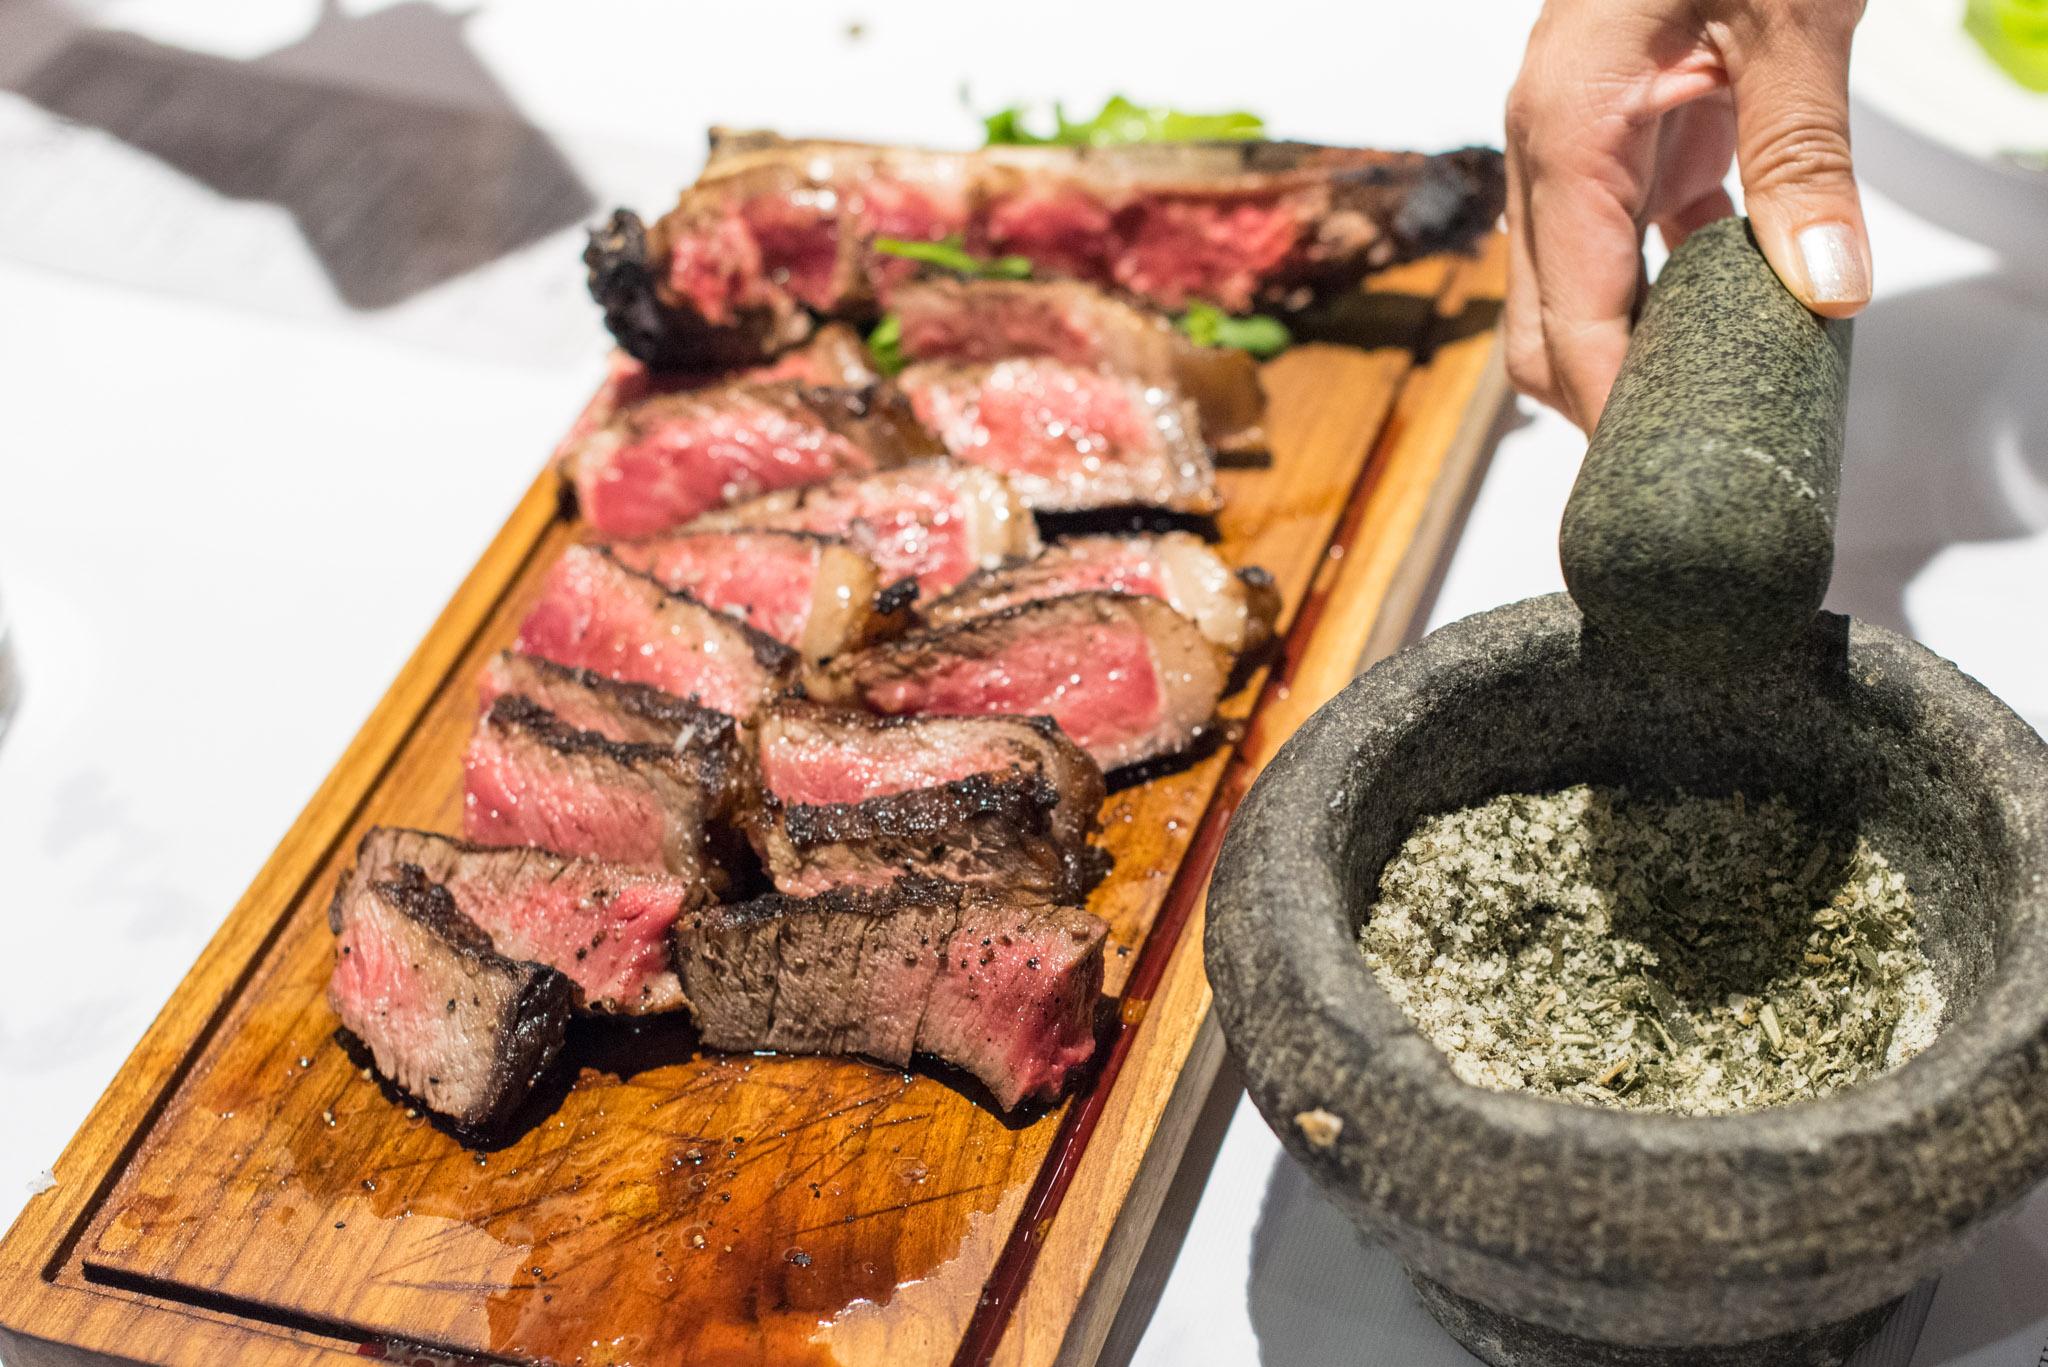 45 days Dry Aged Corn-fed Traditional Fiorentina Steak (S$22++ per 100g) District 10 Suntec City